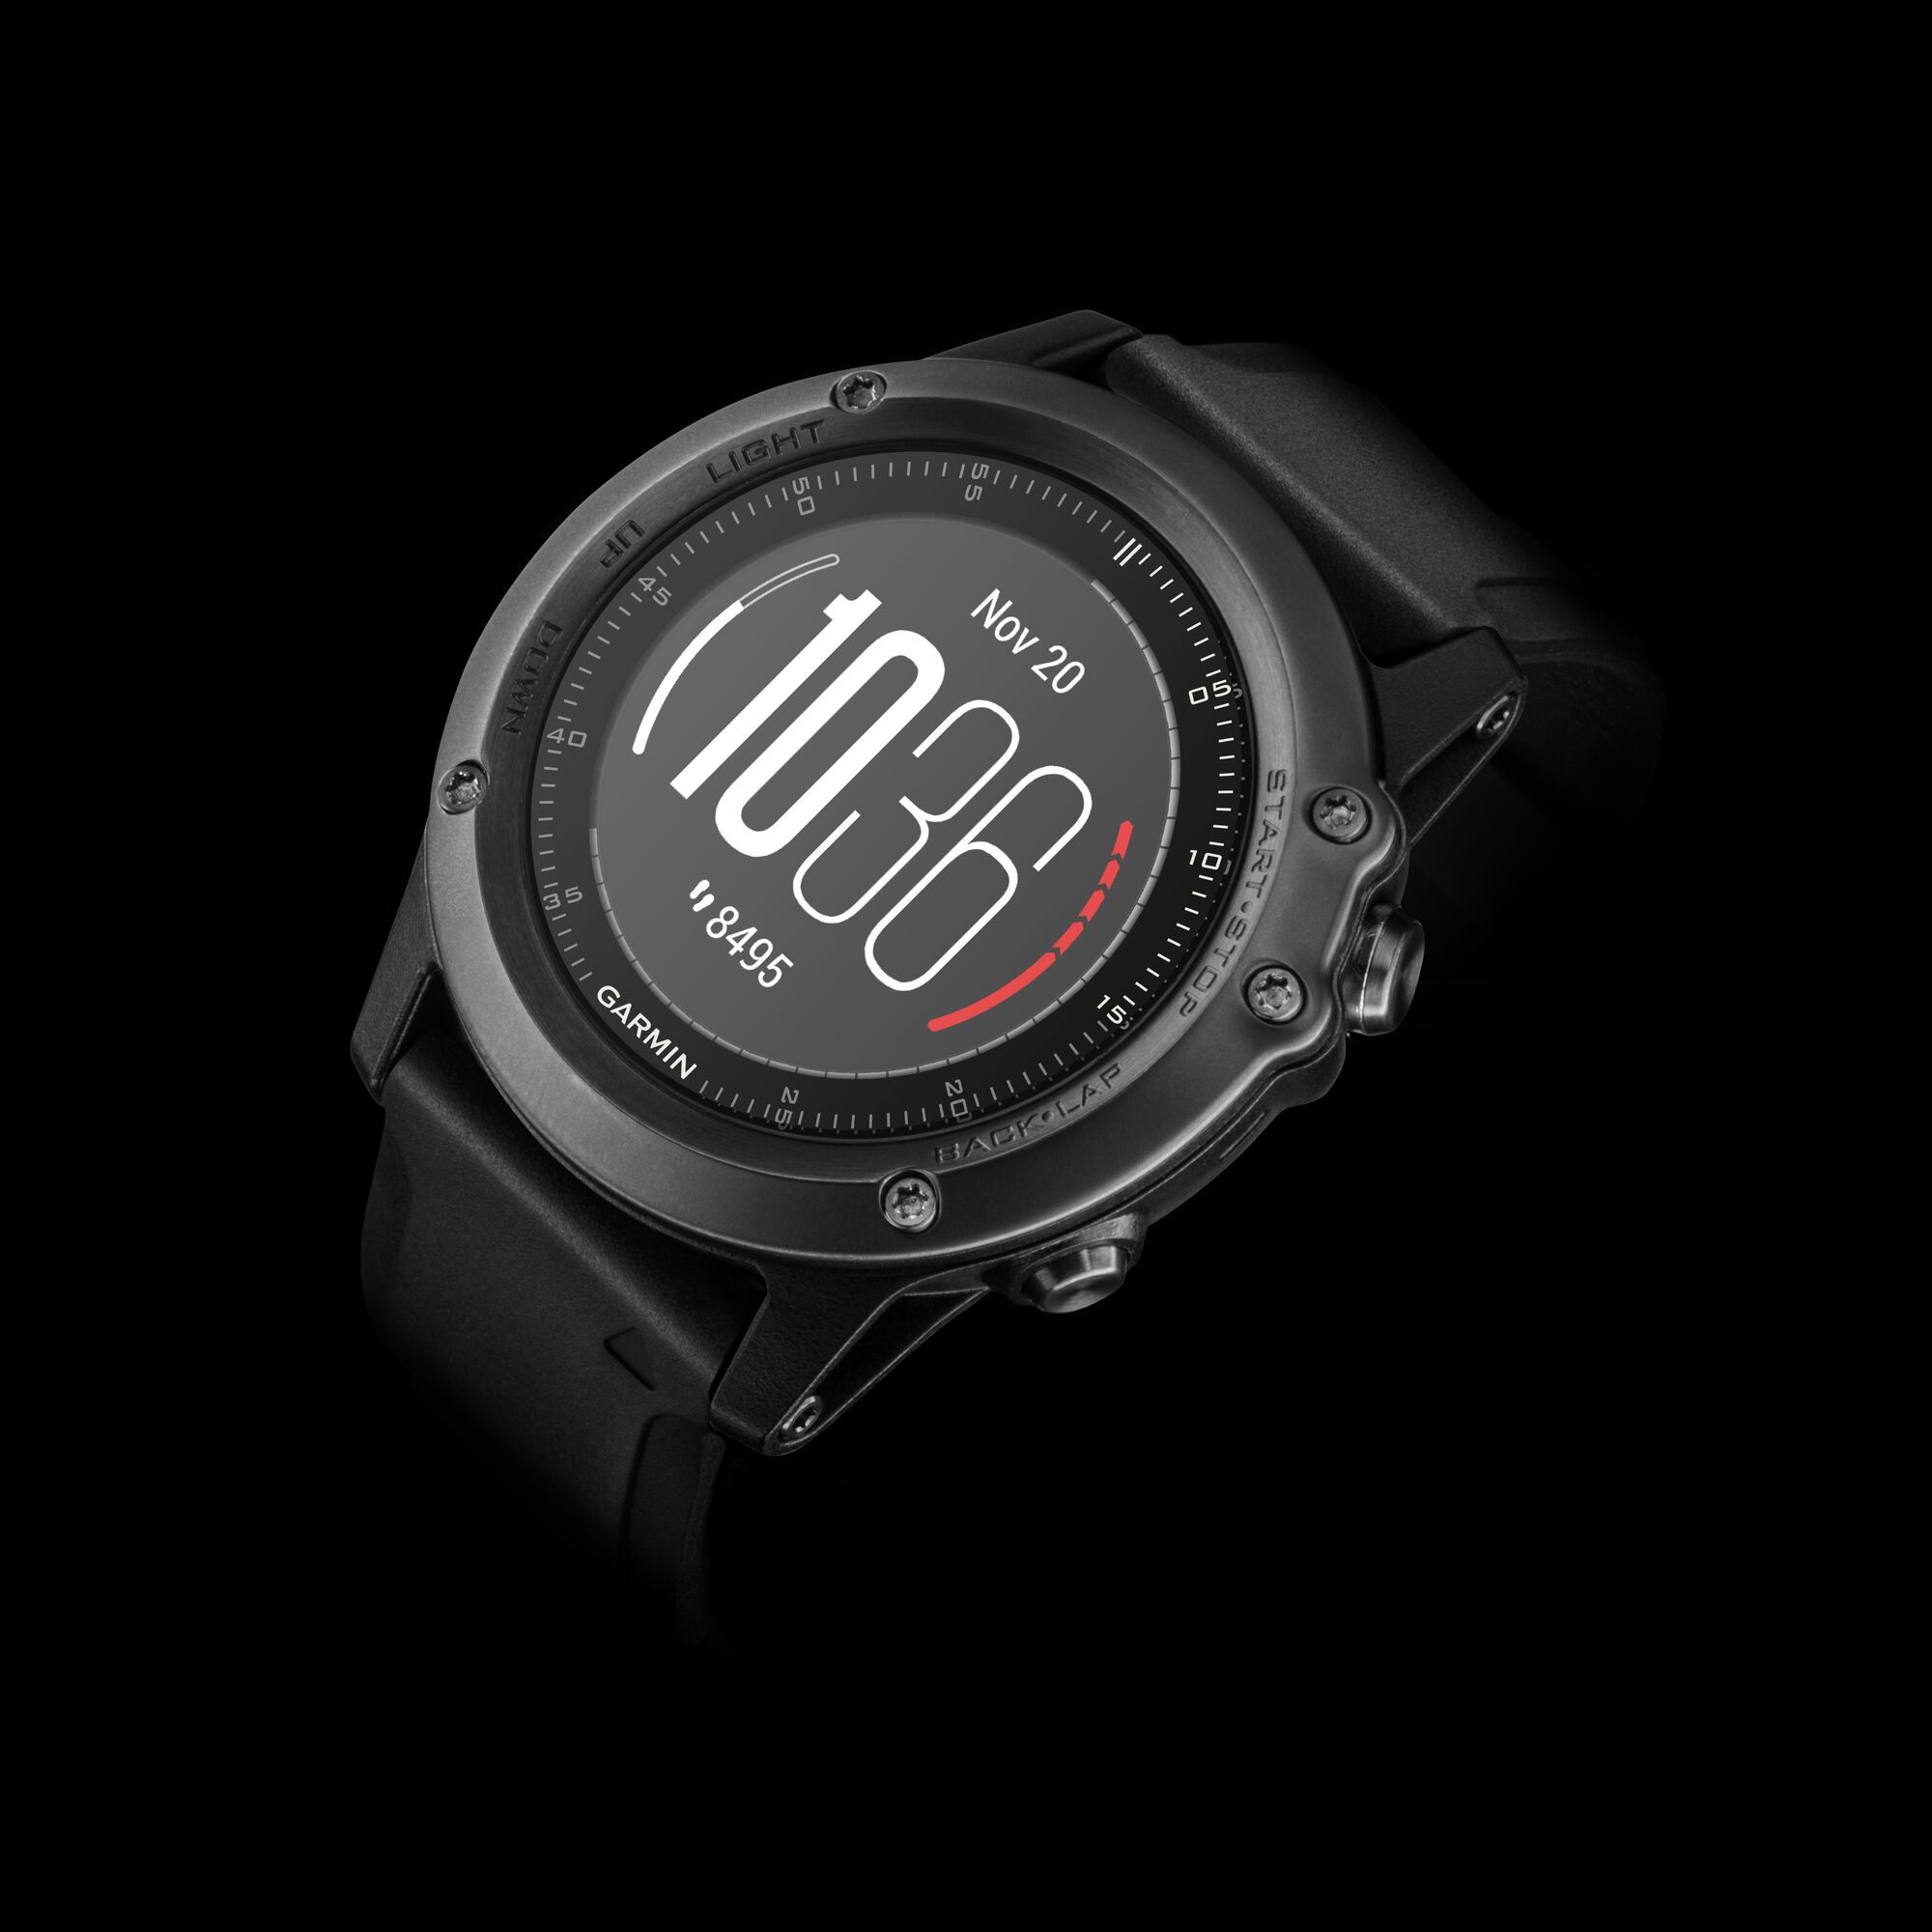 Buy Garmin Fenix 3 Saphir Hr Pulse Watch Grey Online Jogging Point